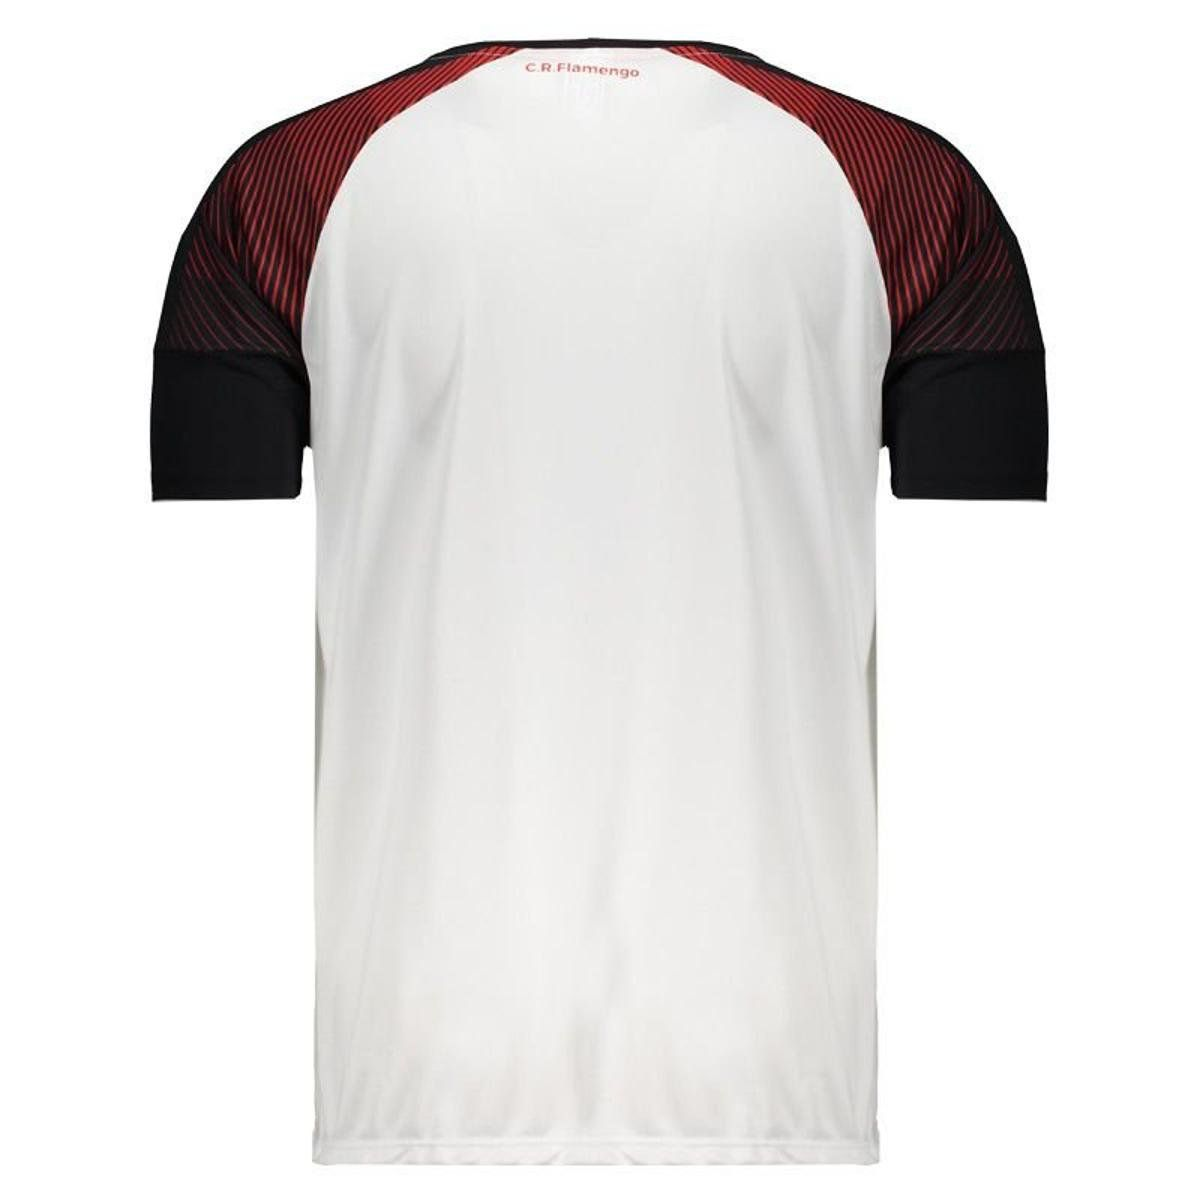 Camisa Braziline Flamengo Fortune - Masculino - Branco e Vermelho